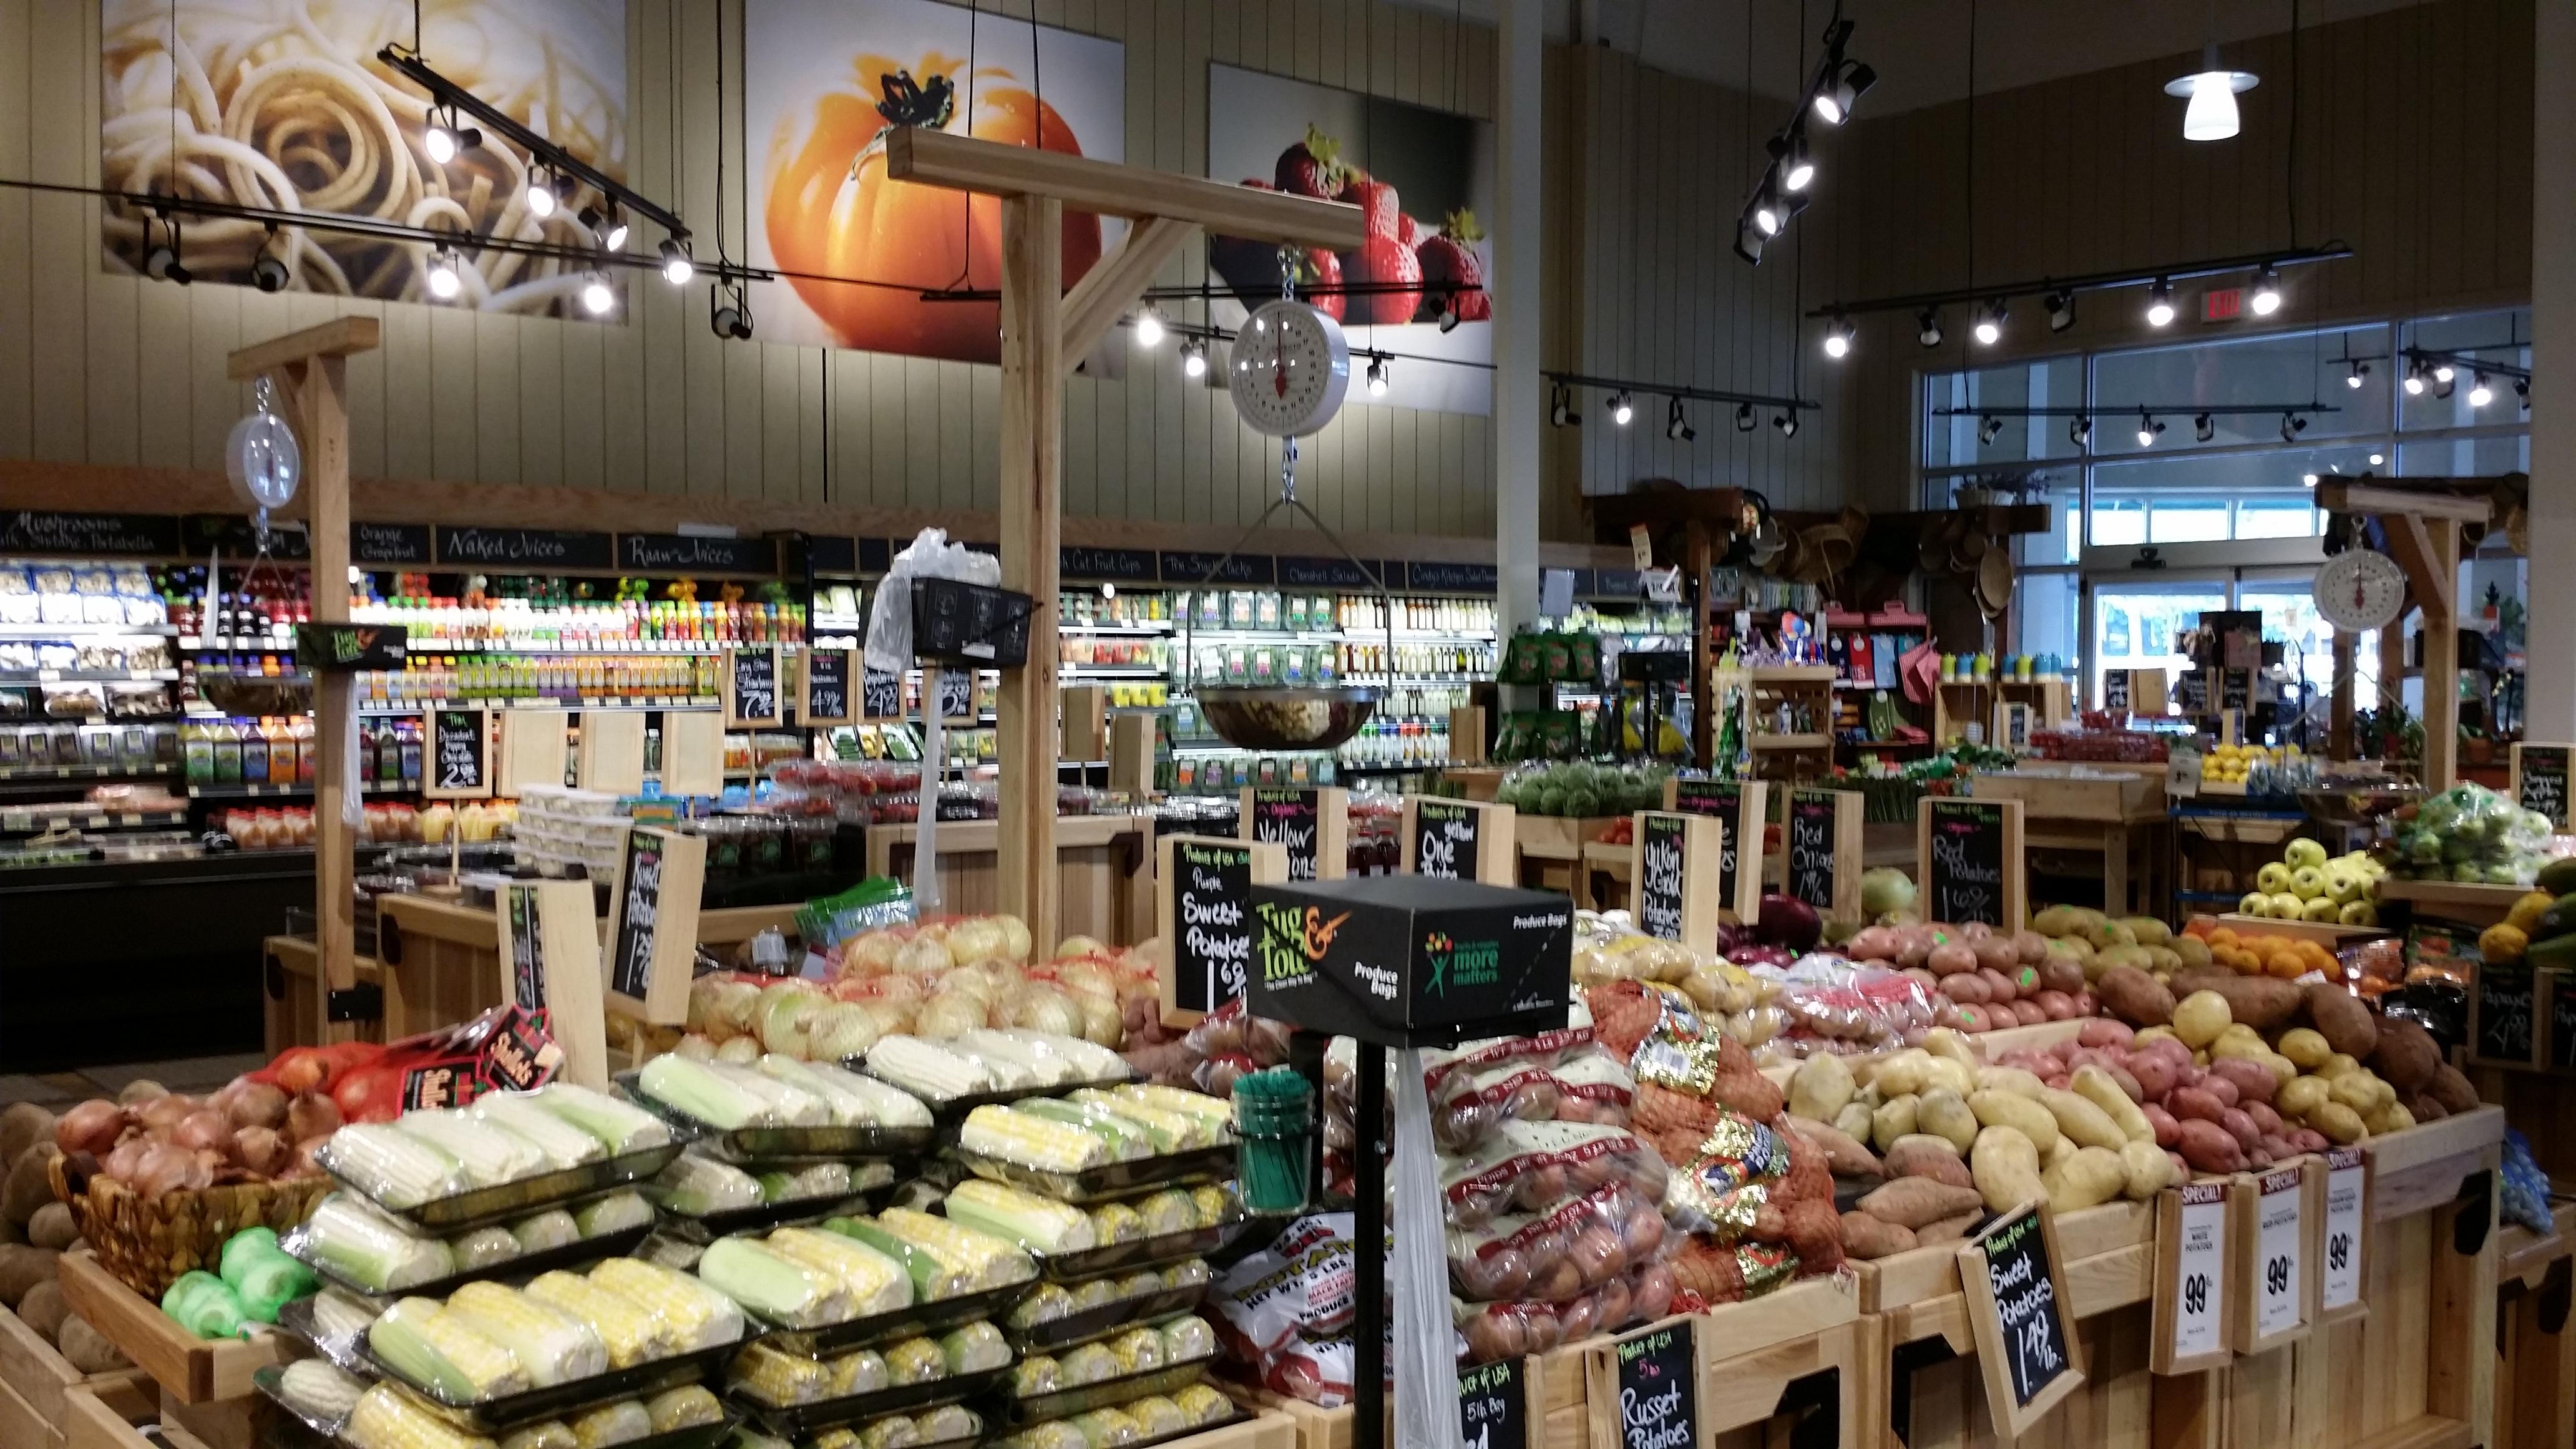 The Fresh Market On Old Alabama Road Visit – Photos Around ...